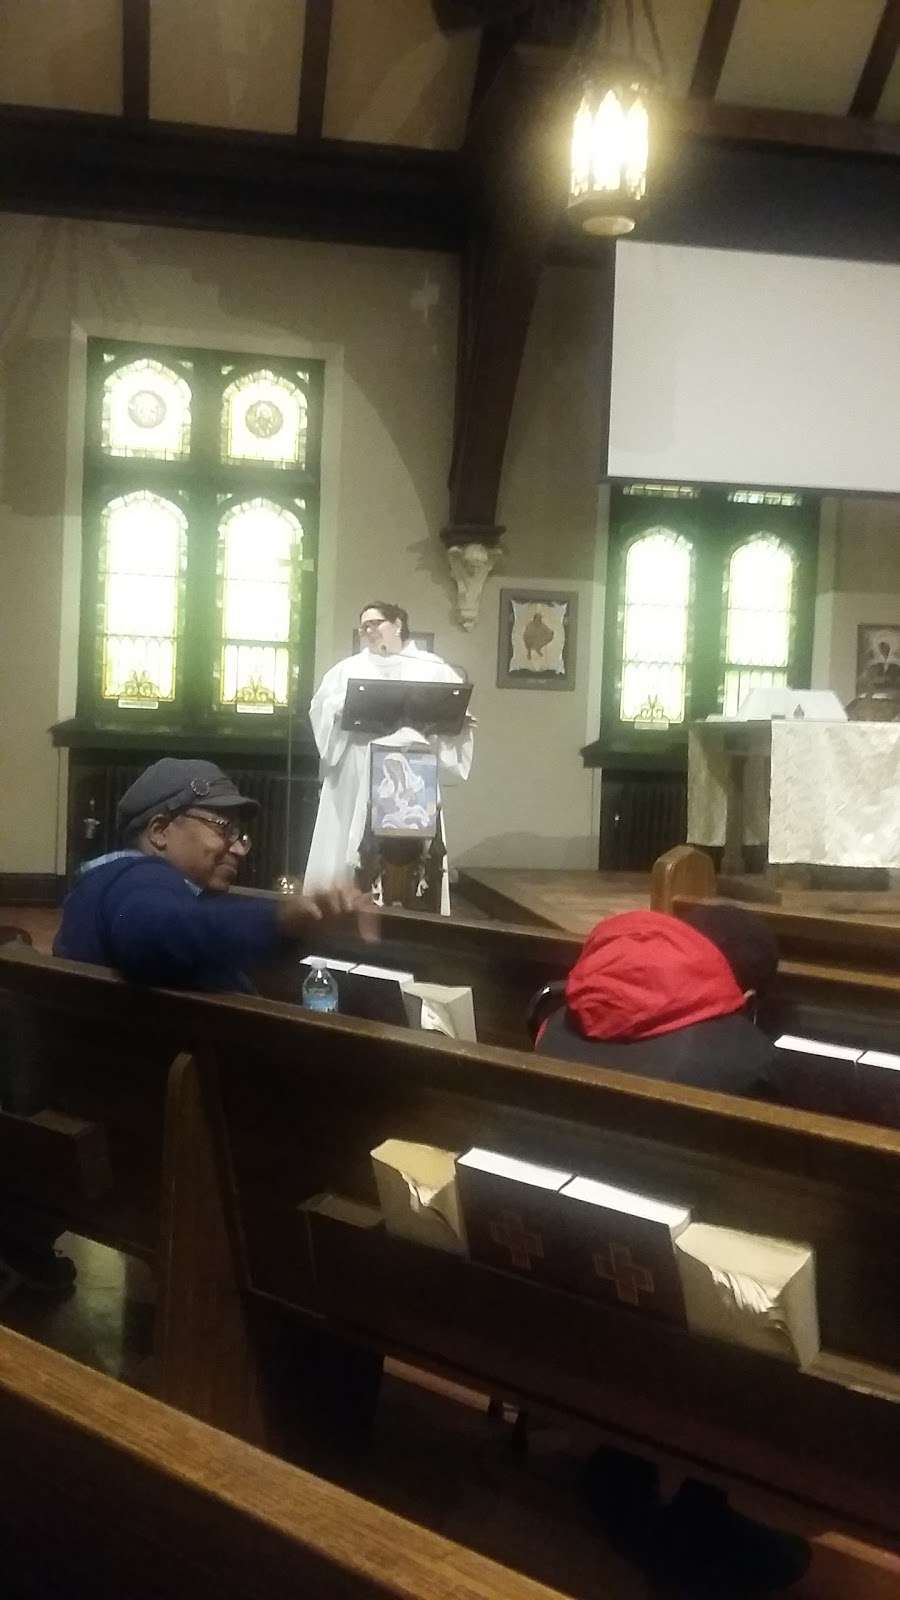 All Peoples Church - church  | Photo 8 of 10 | Address: 2600 N 2nd St, Milwaukee, WI 53212, USA | Phone: (414) 264-1616